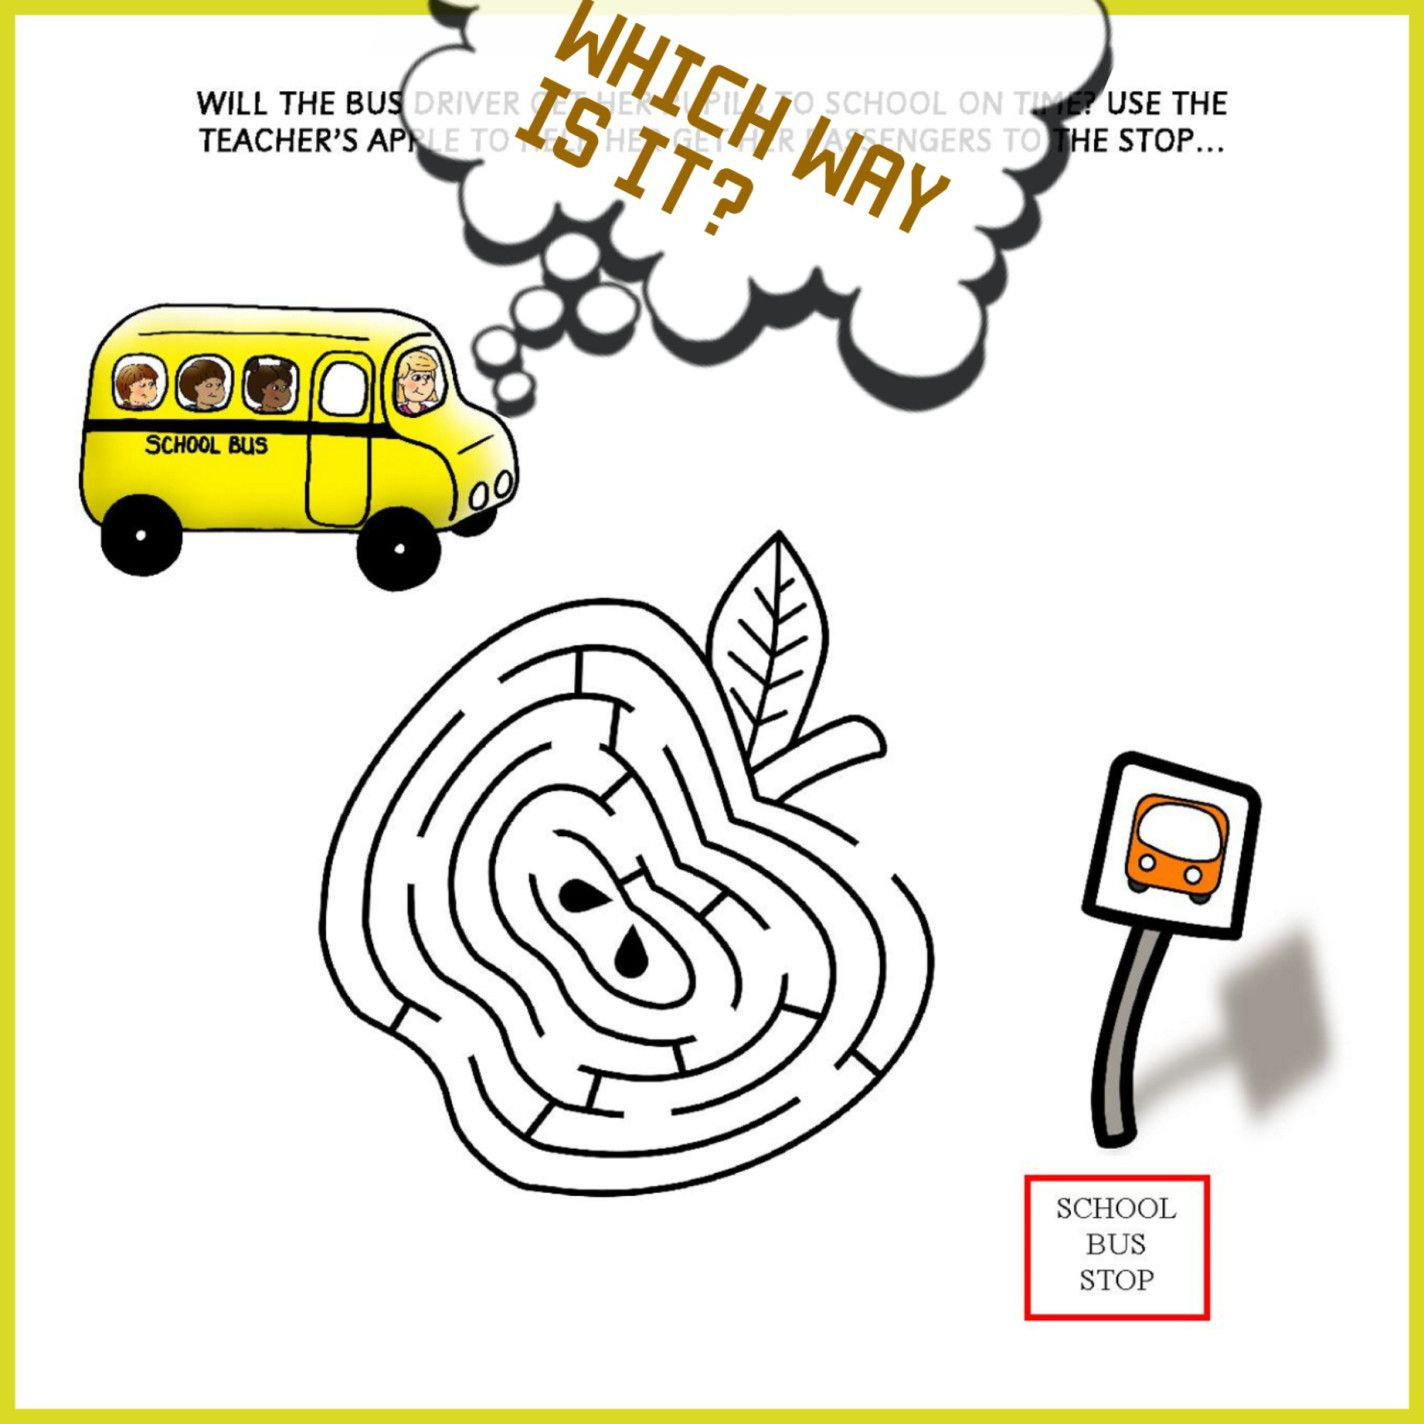 School Bus Passengers